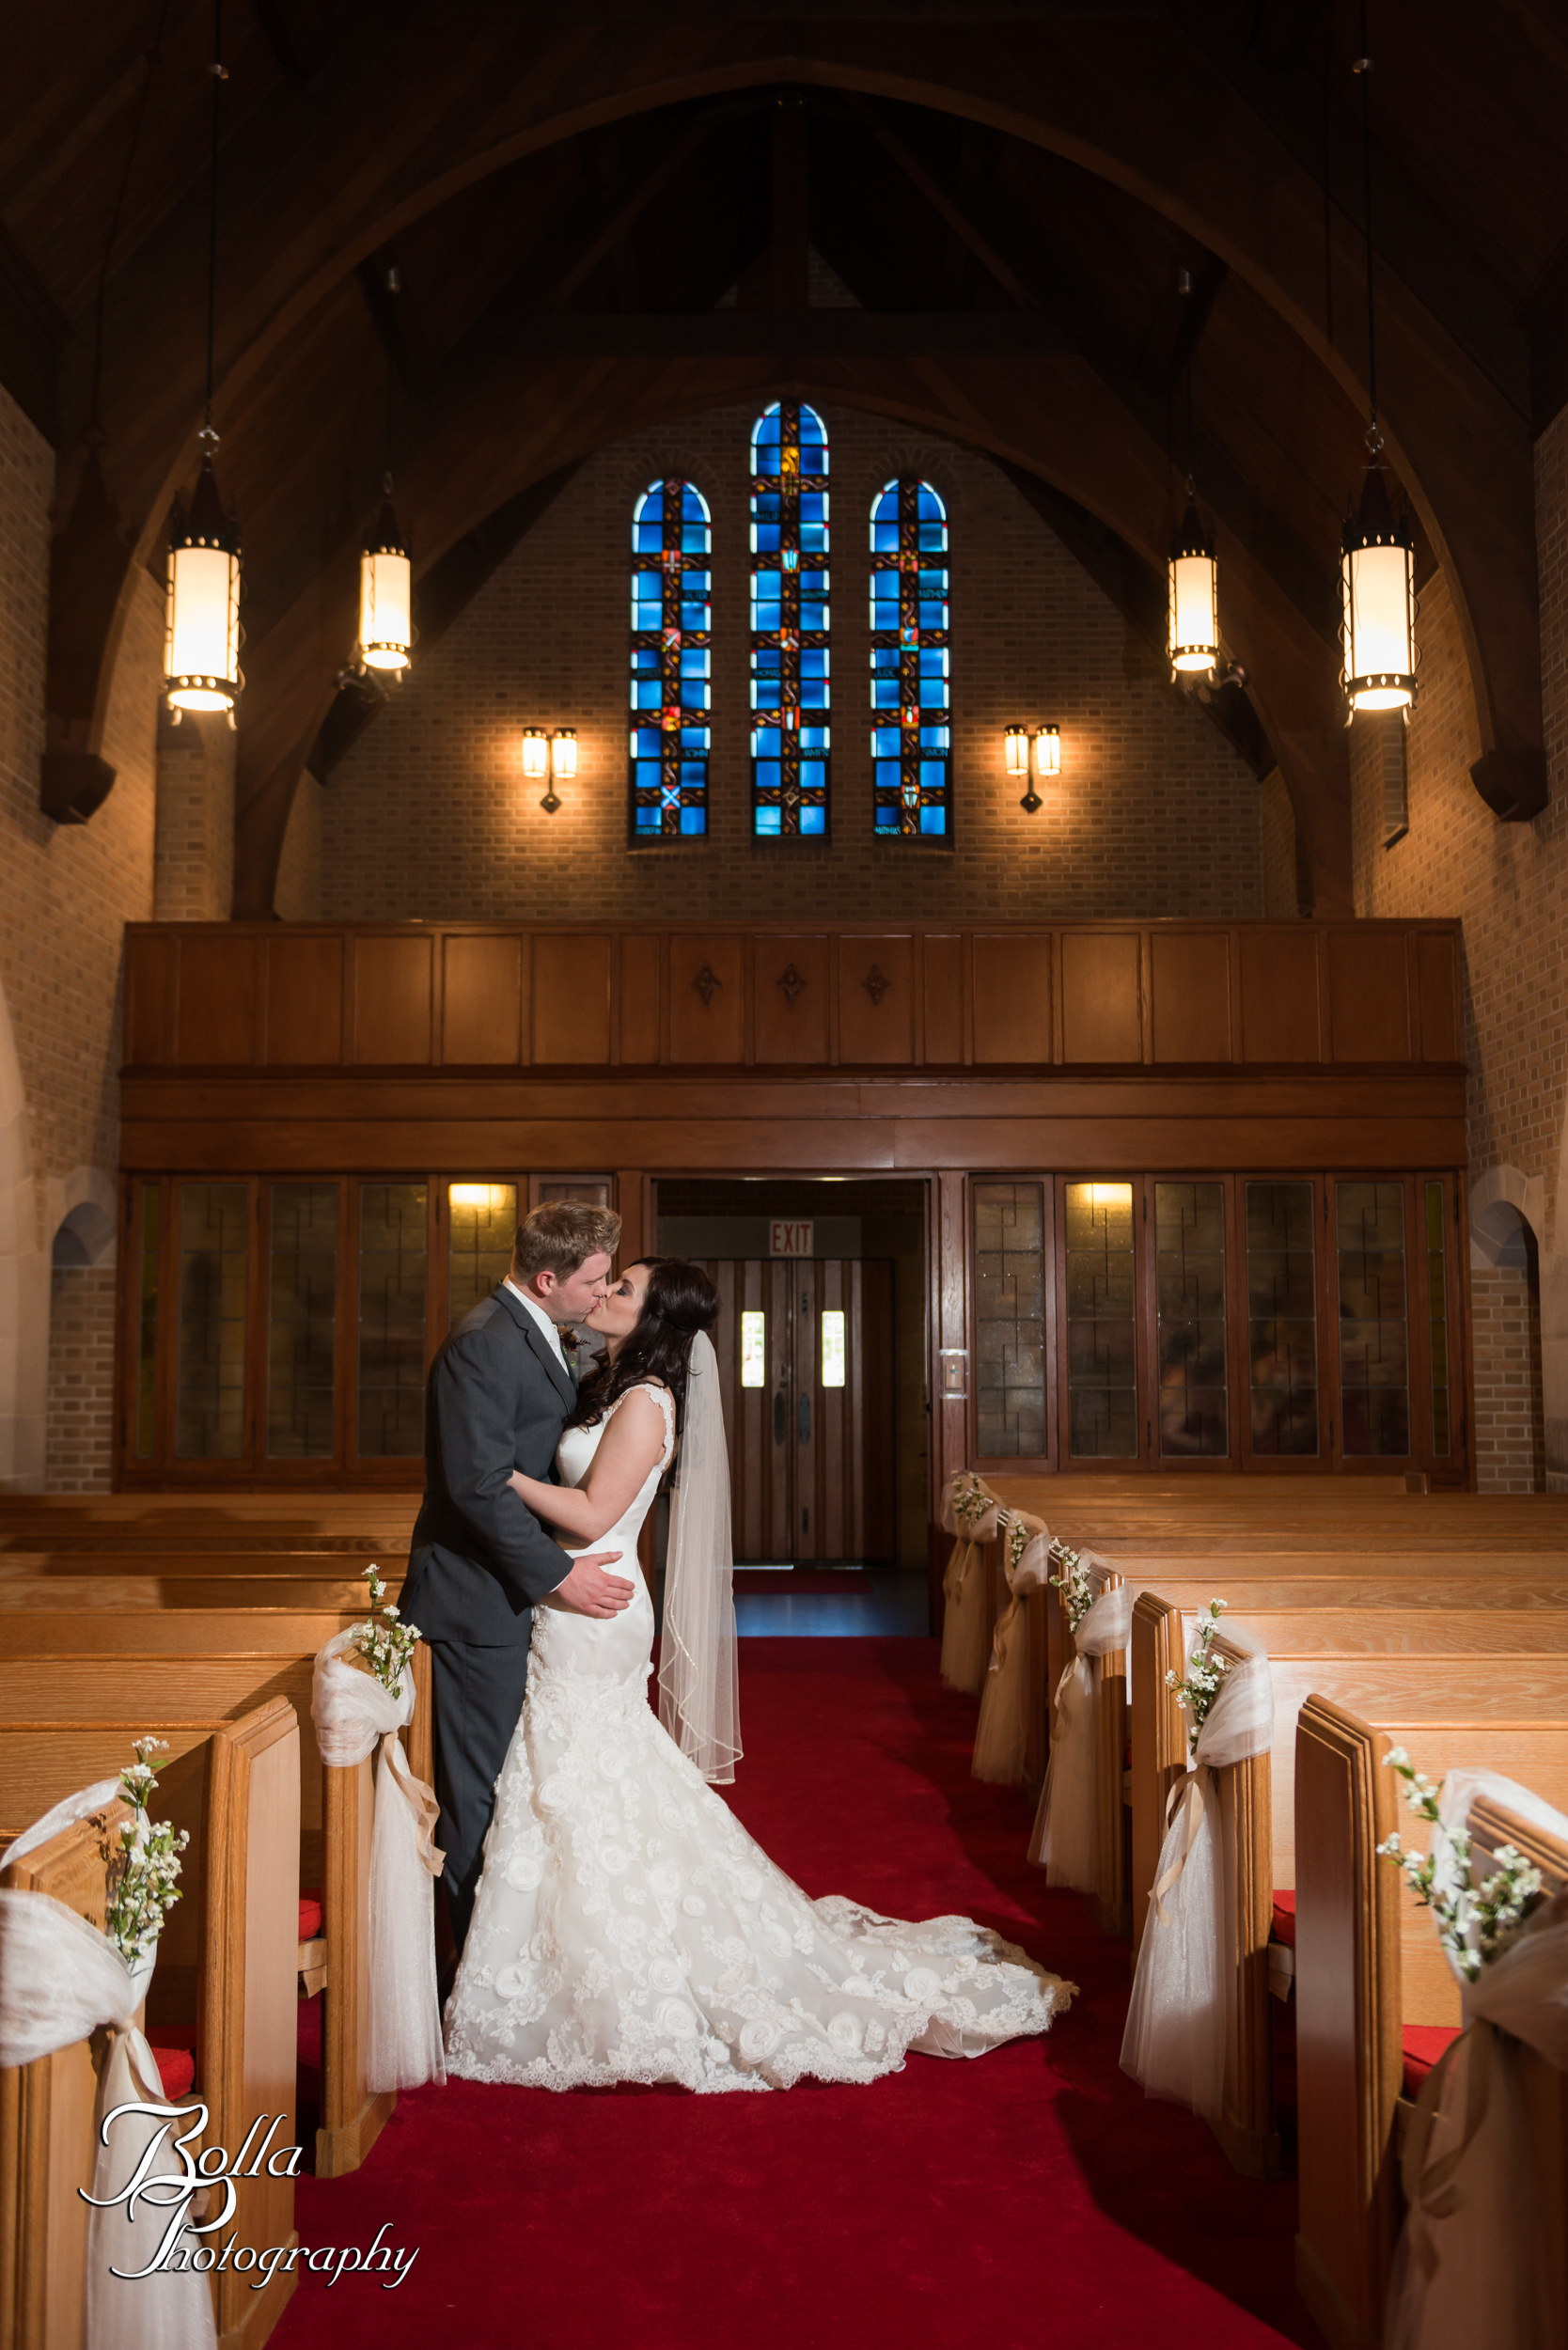 Bolla_photography_edwardsville_wedding_photographer_st_louis_weddings_Reilmann-0001.jpg